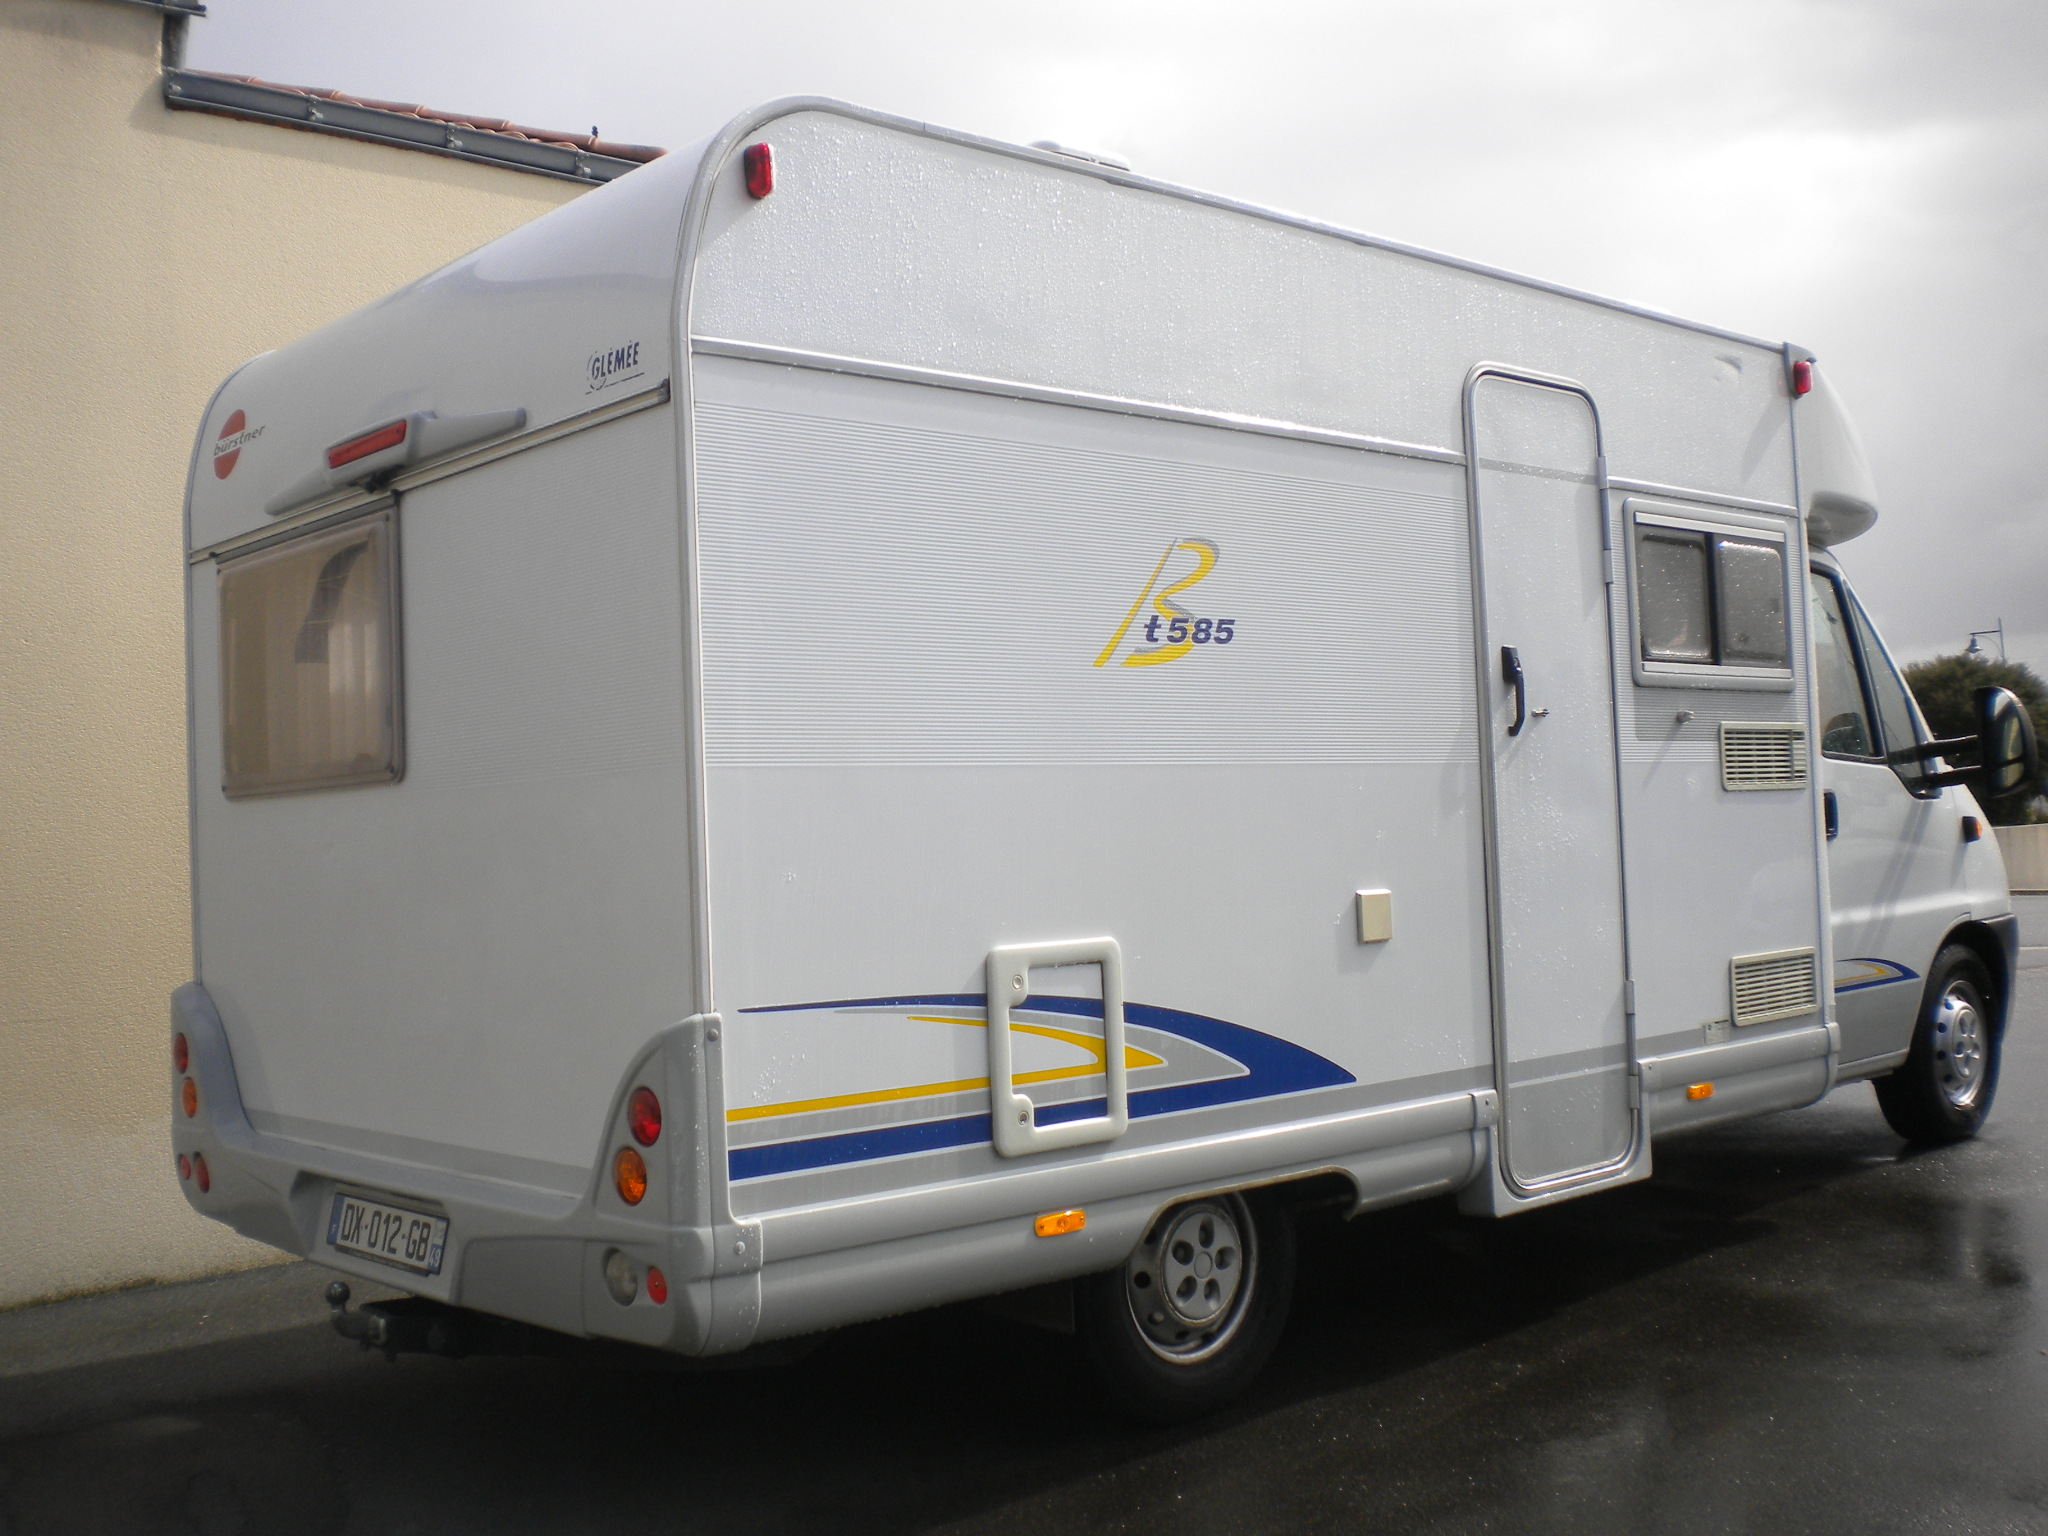 burstner t 585 occasion de 2004 fiat camping car en vente cholet maine et loire 49. Black Bedroom Furniture Sets. Home Design Ideas